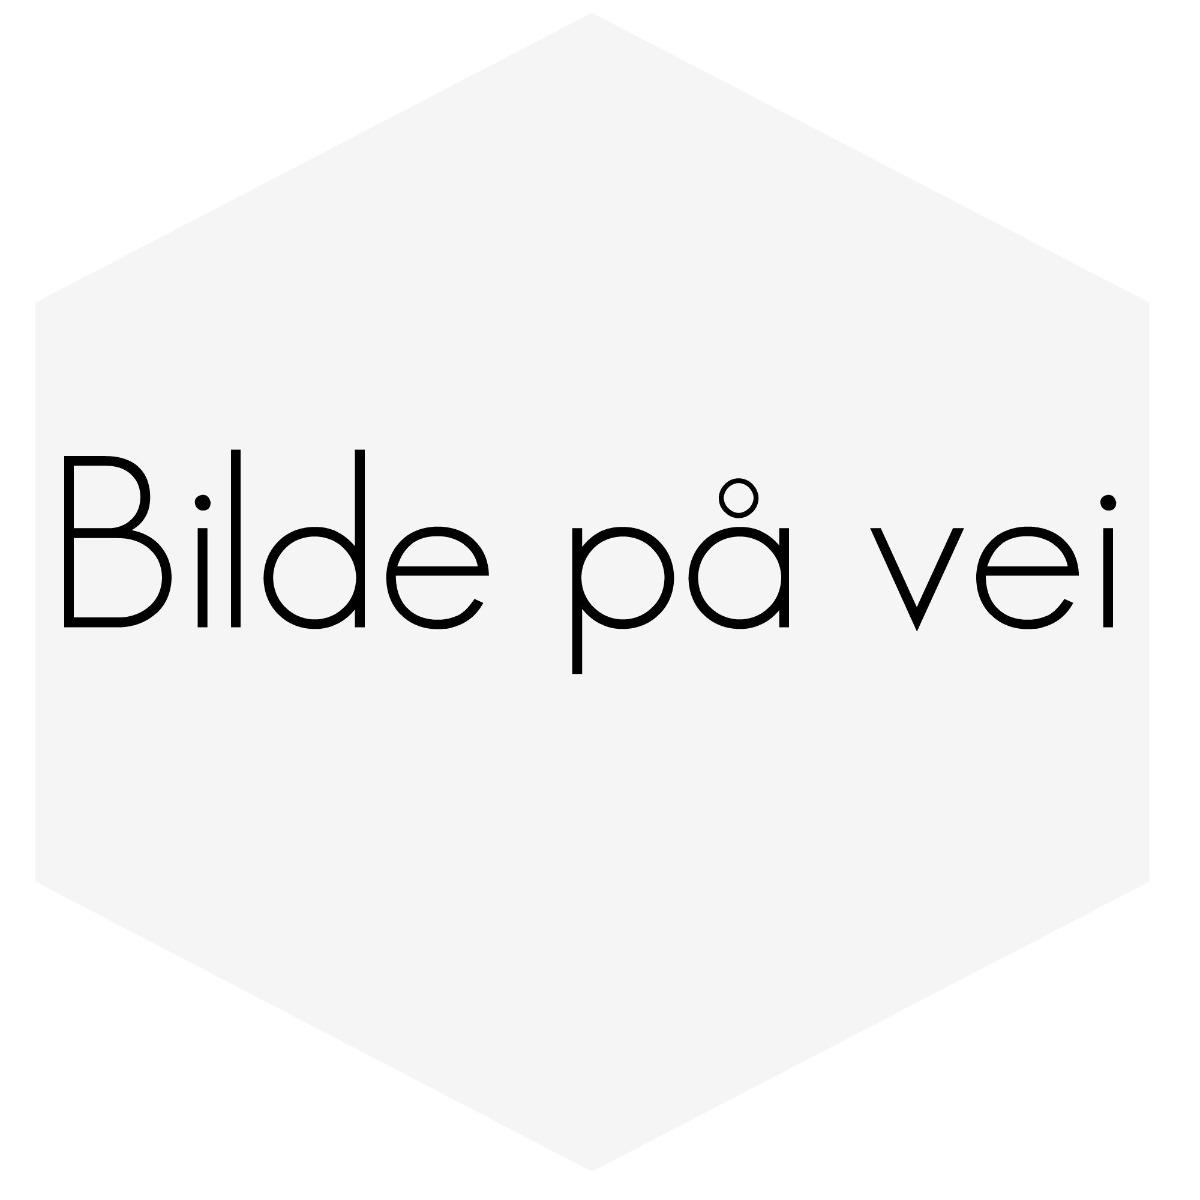 "SILIKONSLANGE RØD REDUSERING 1,625-2"" (41-51MM)"